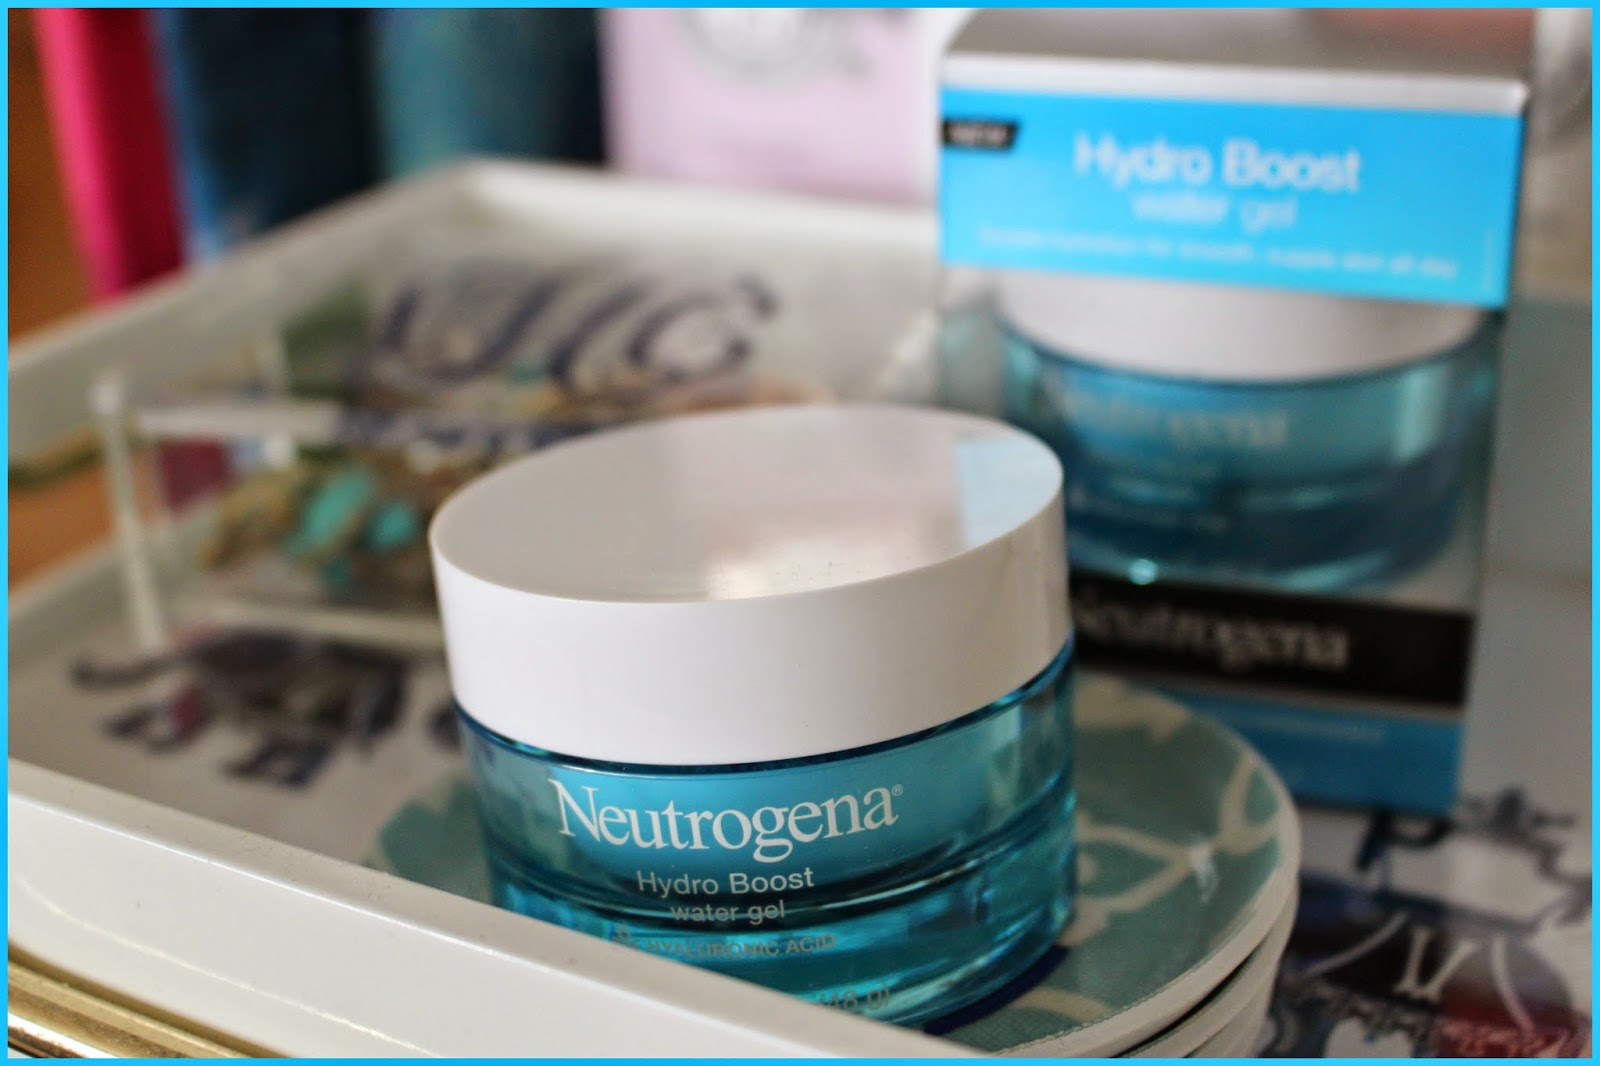 neutrogena gel cream review